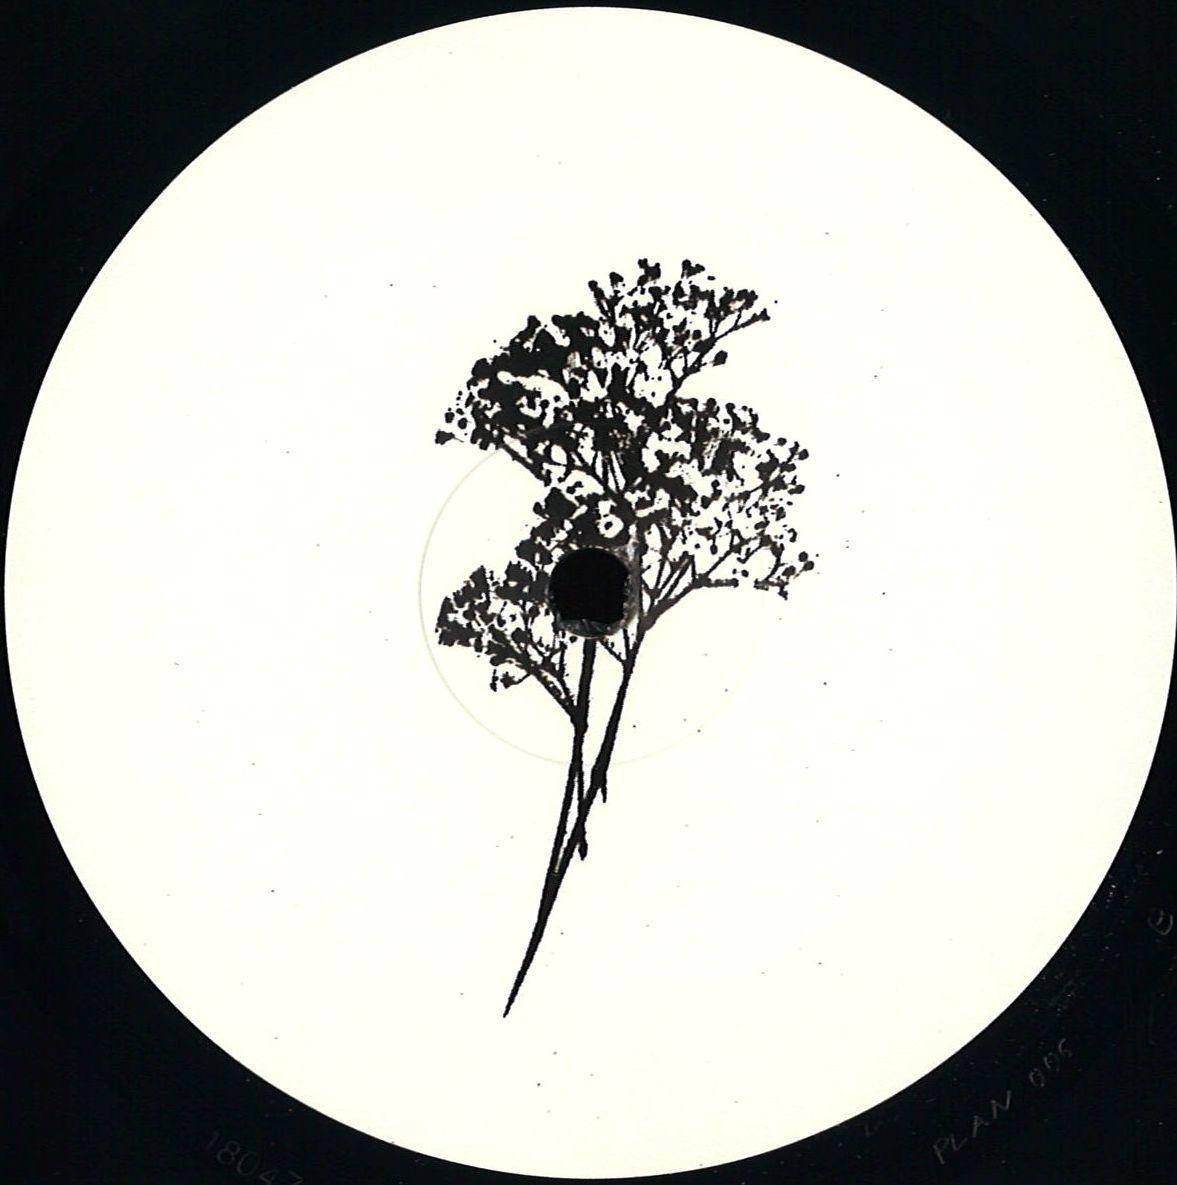 Uchi - Plangent #006 (Plangent Records)